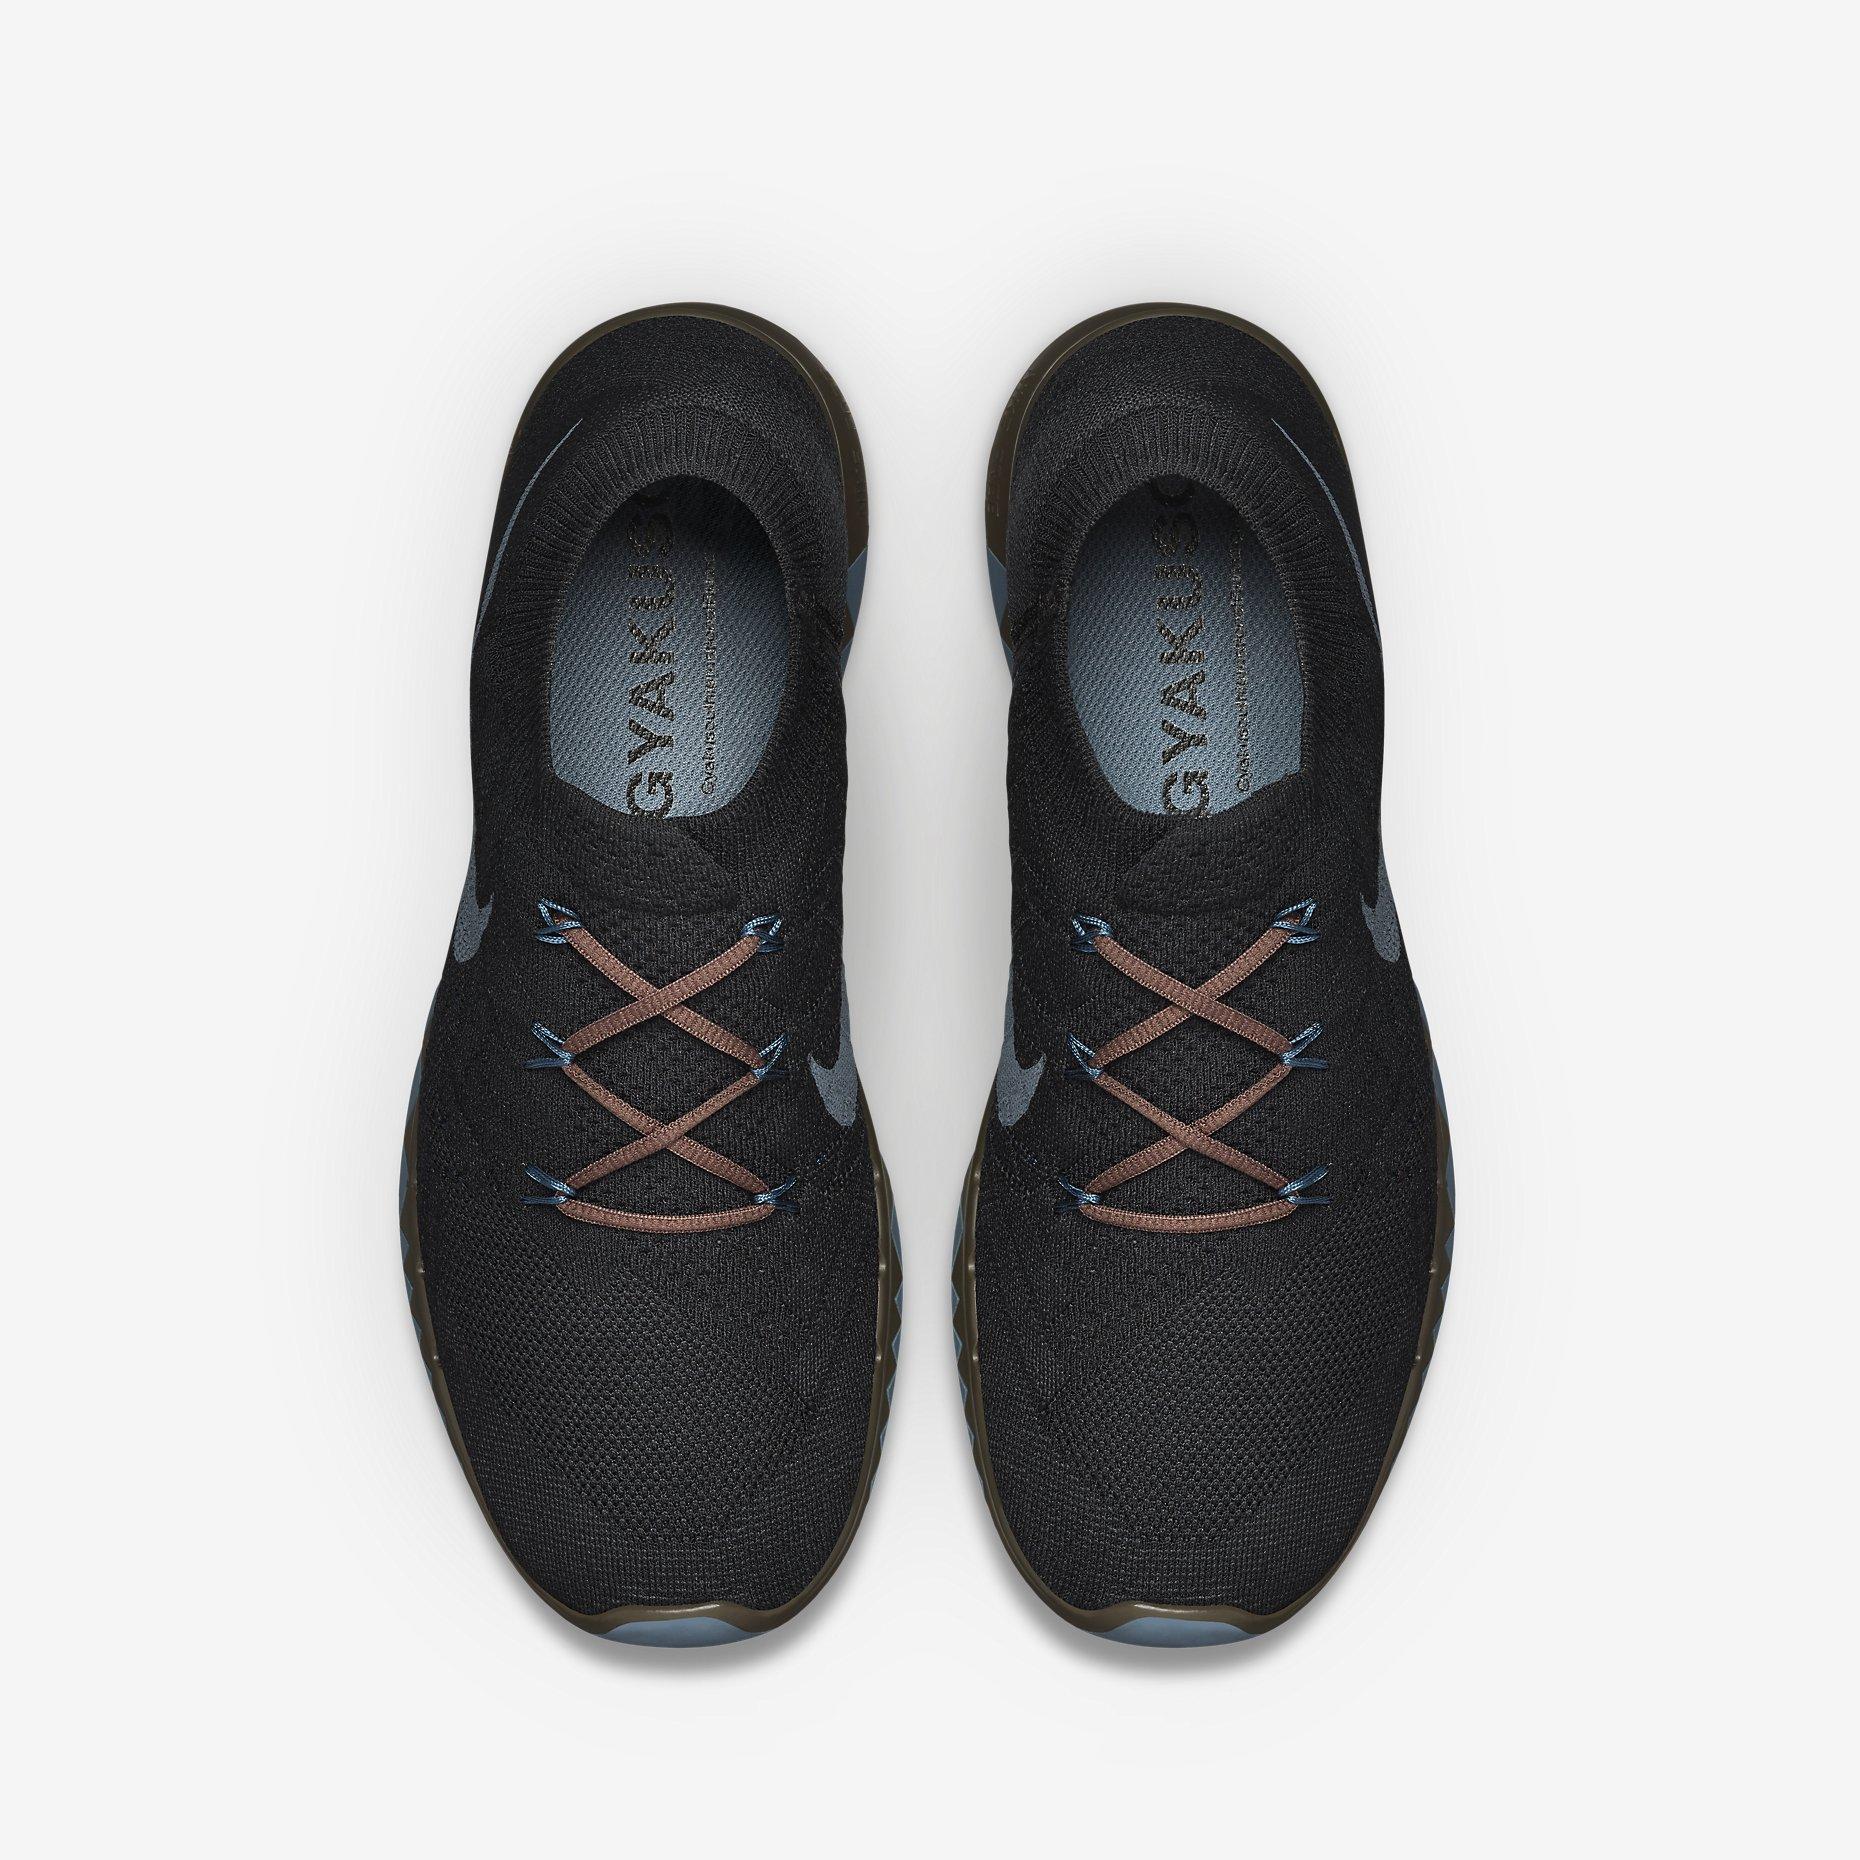 best service f0c36 b4d03 Nike x Undercover Gyakusou Free Flyknit 3.0 Black, Baroque Brown Slate 1;  Very Goods NikeLab Gyakusou Free 3.0 Flyknit Unisex Running Shoe (Men s  Sizing).